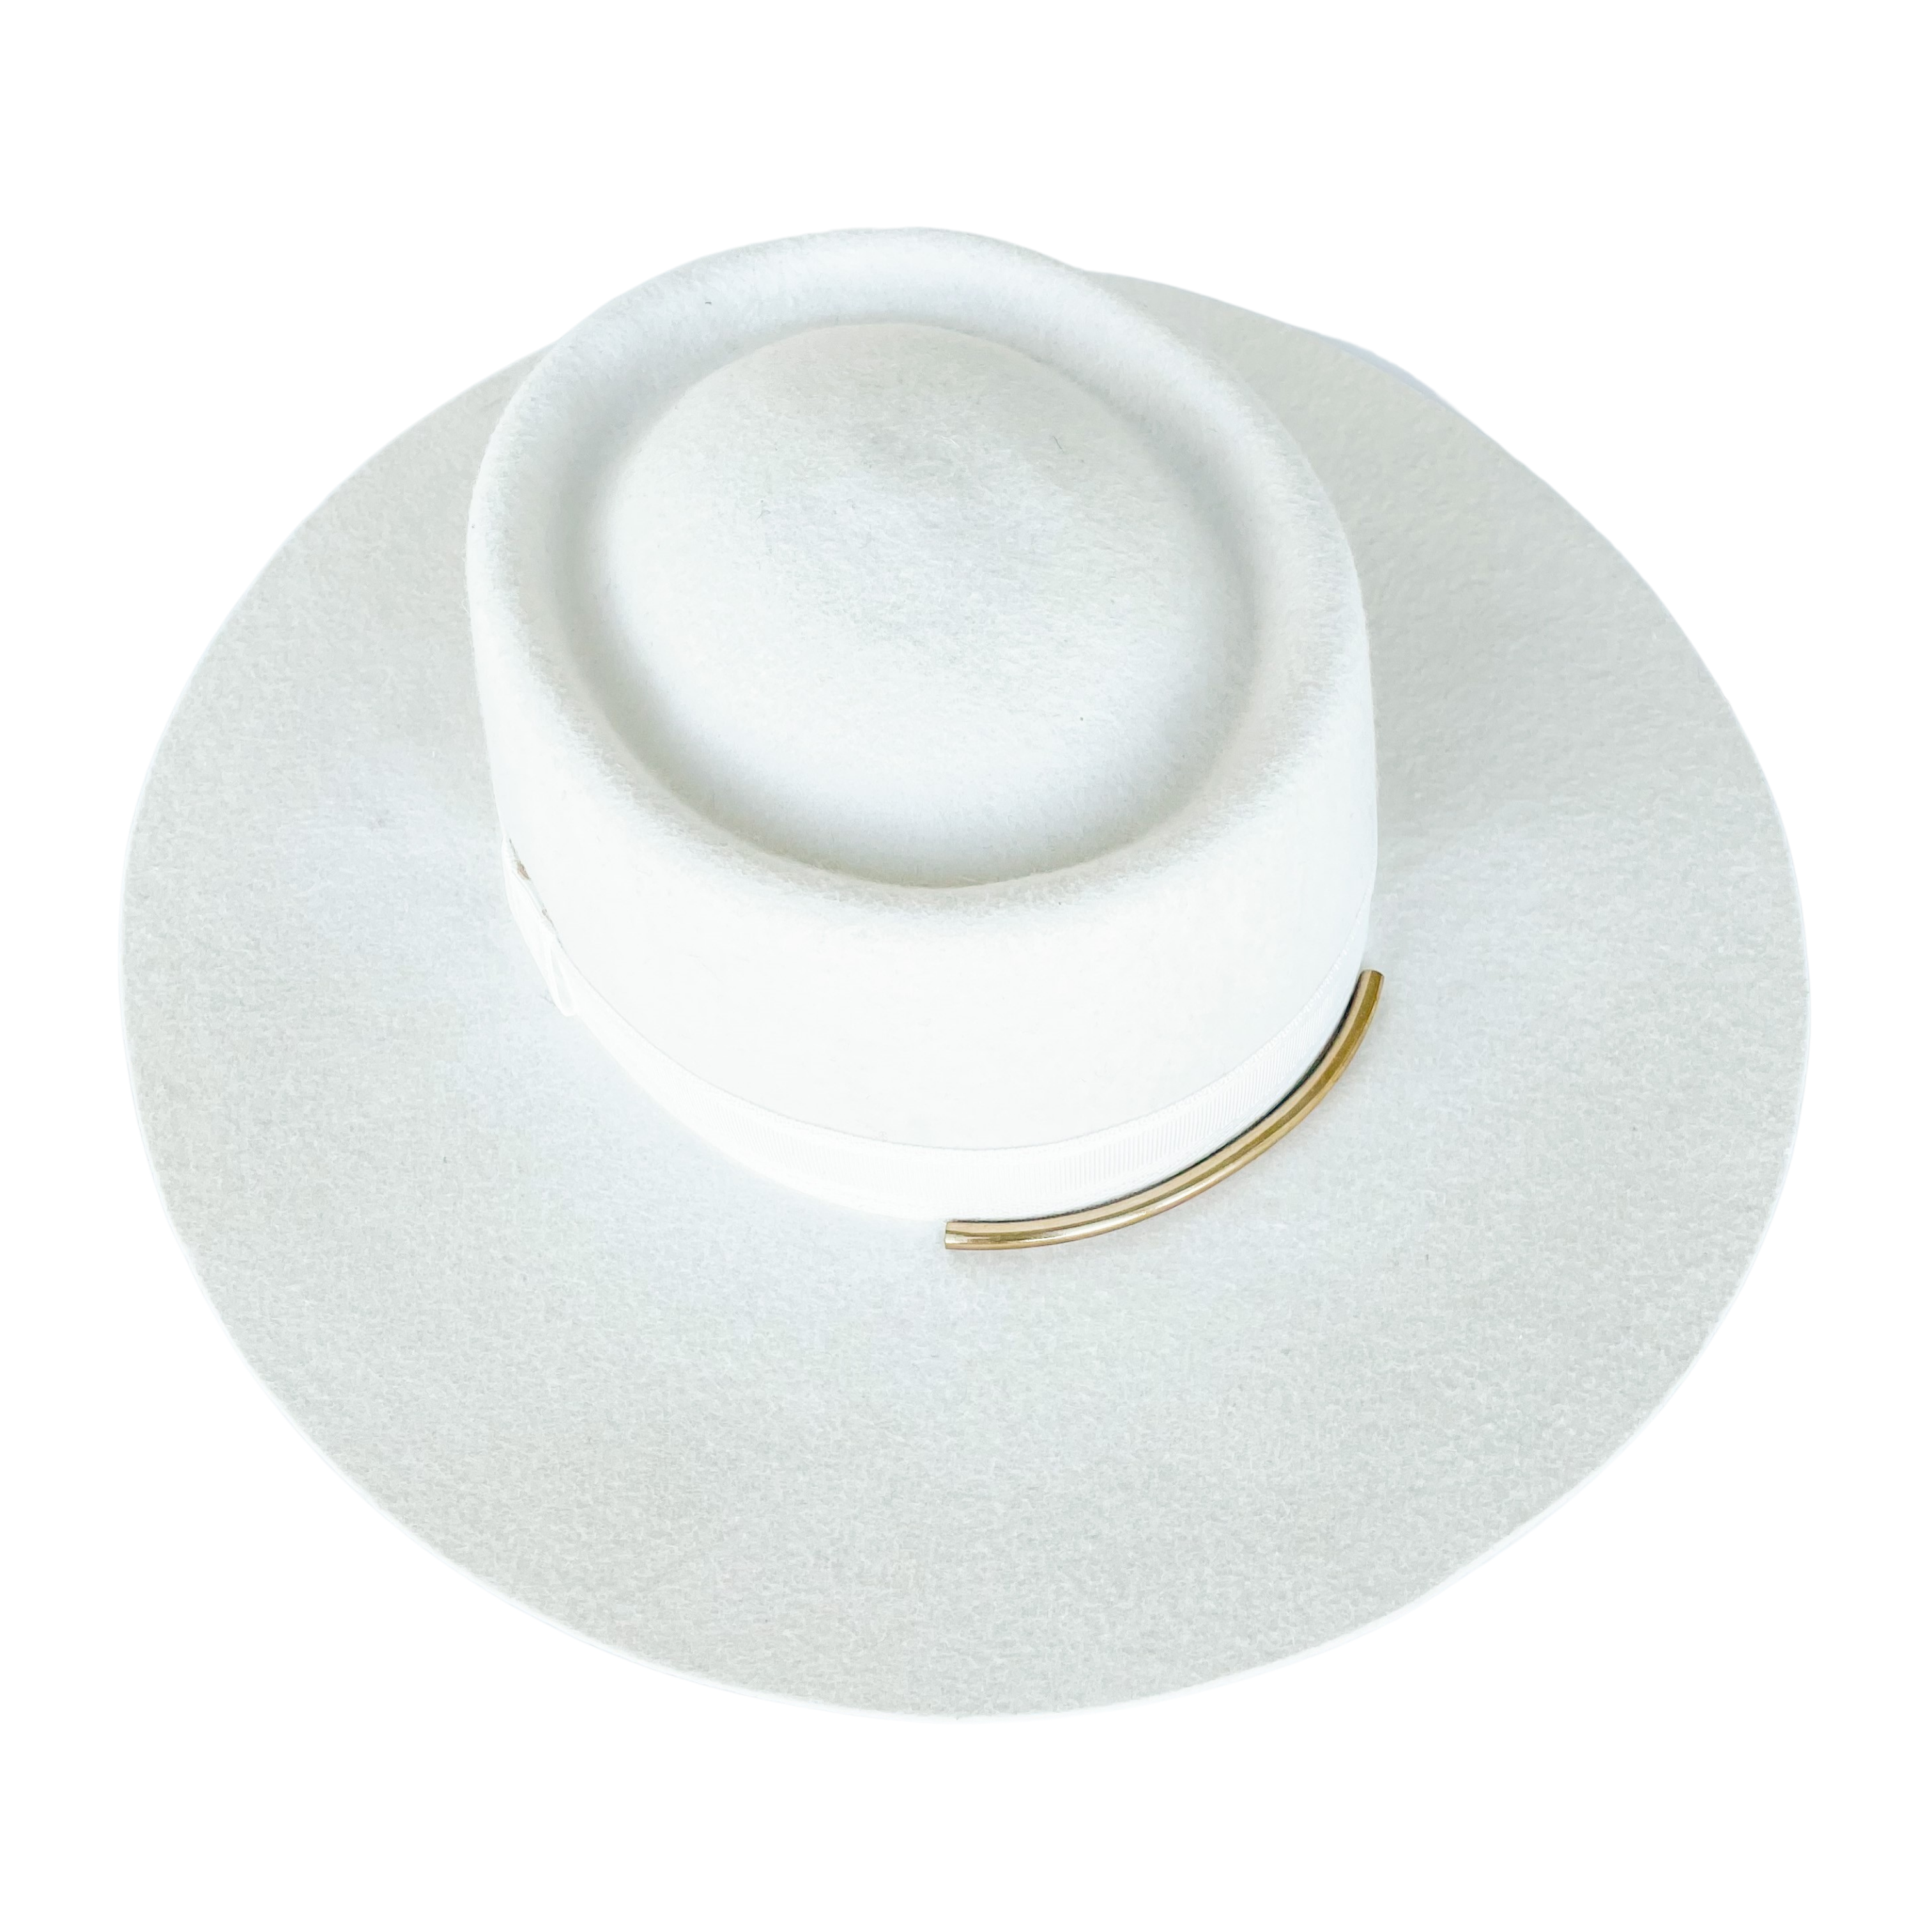 Lauren bridal gambler 100% wool hat with gold accent